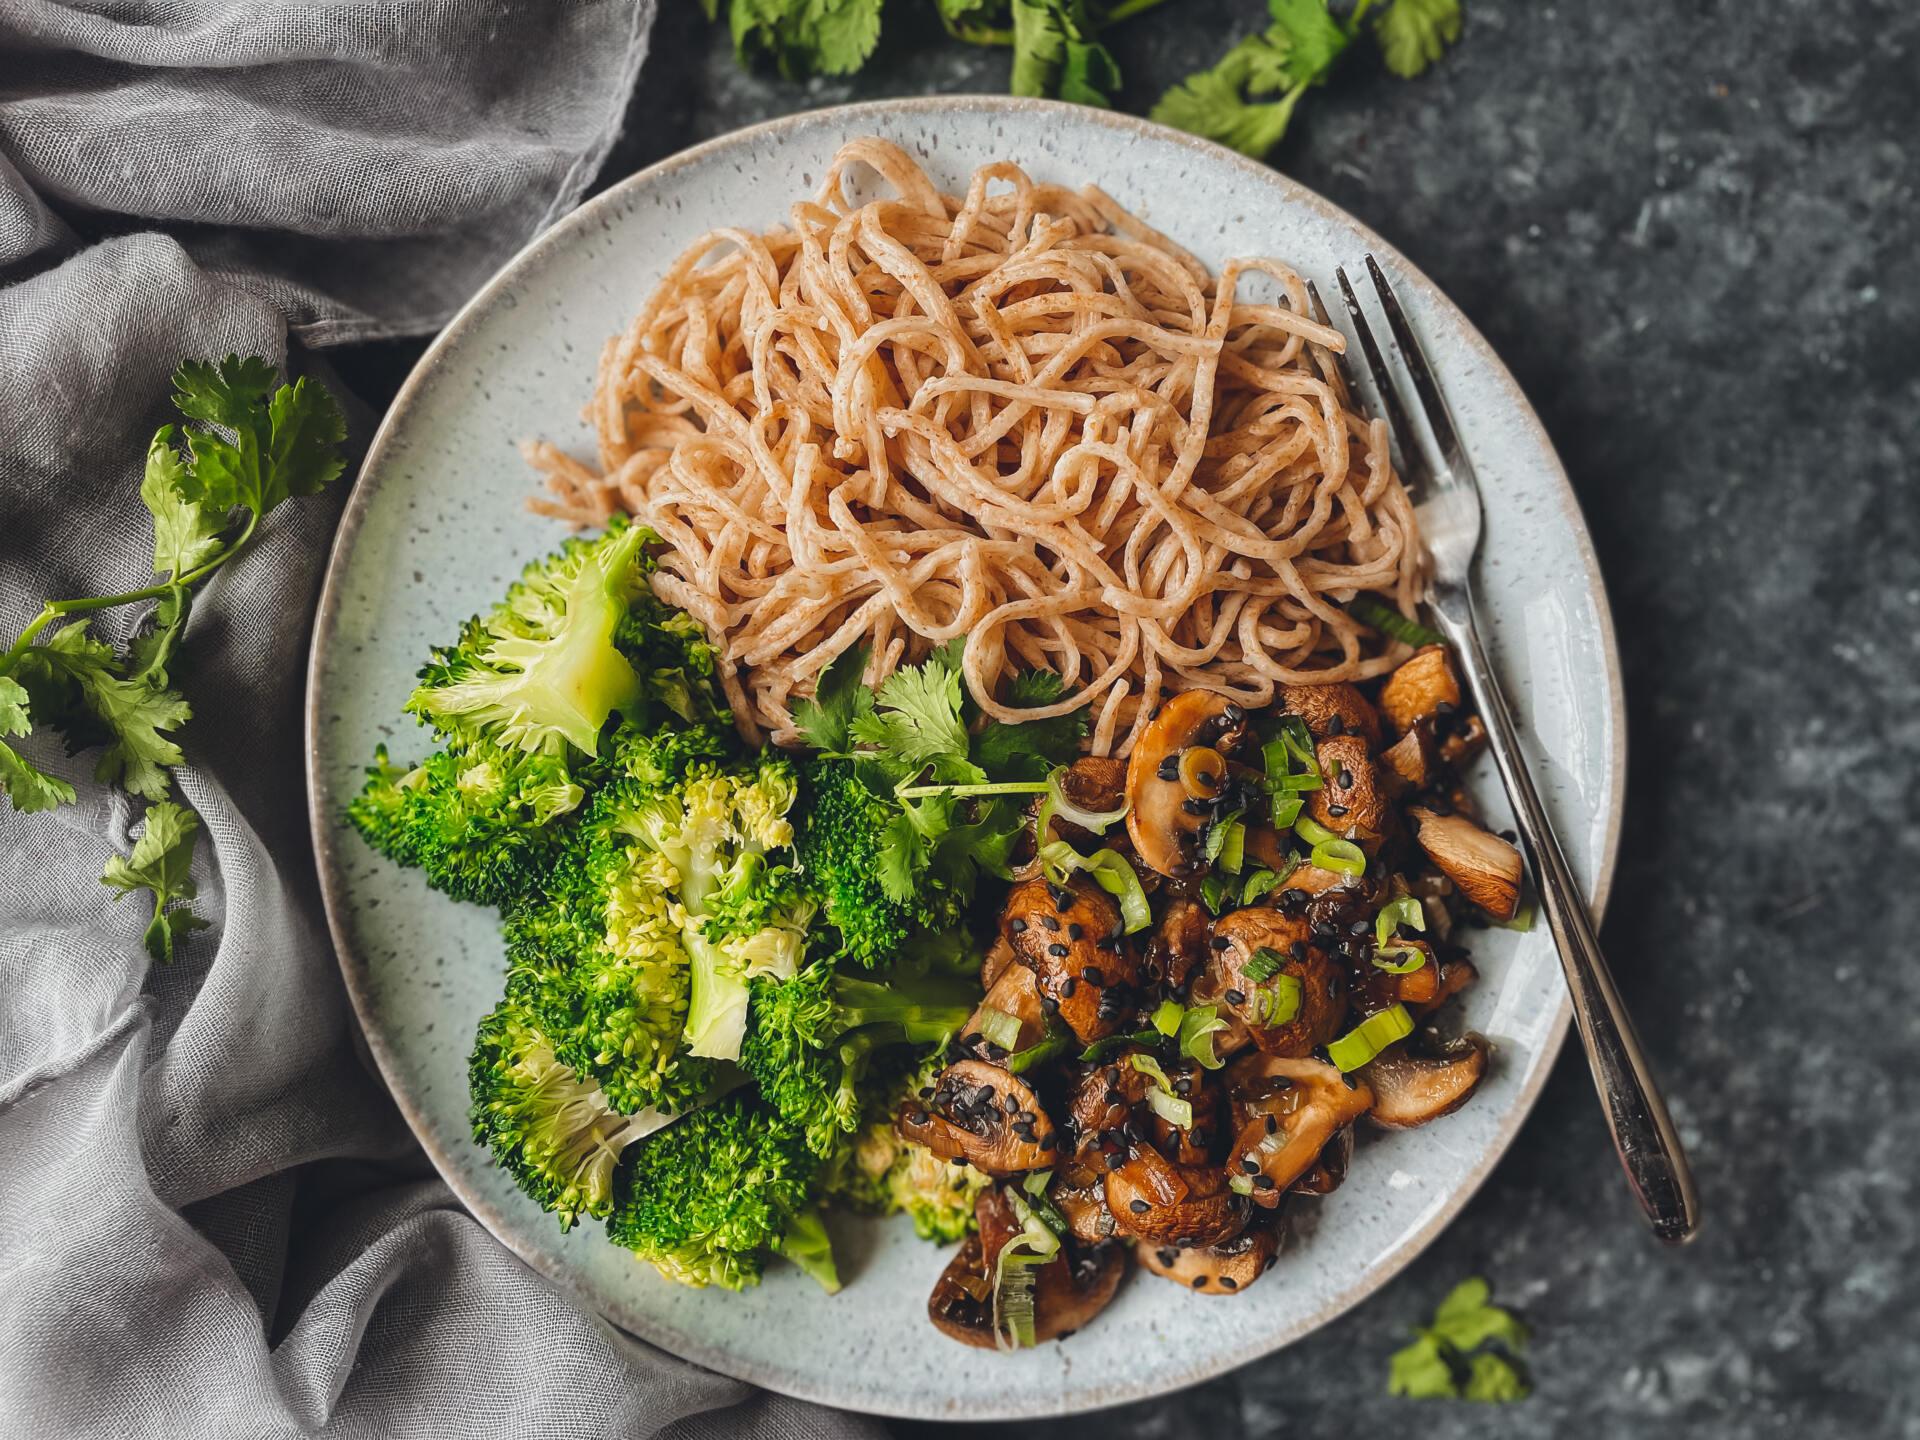 Teriyaki Mushrooms with Wholewheat Noodles